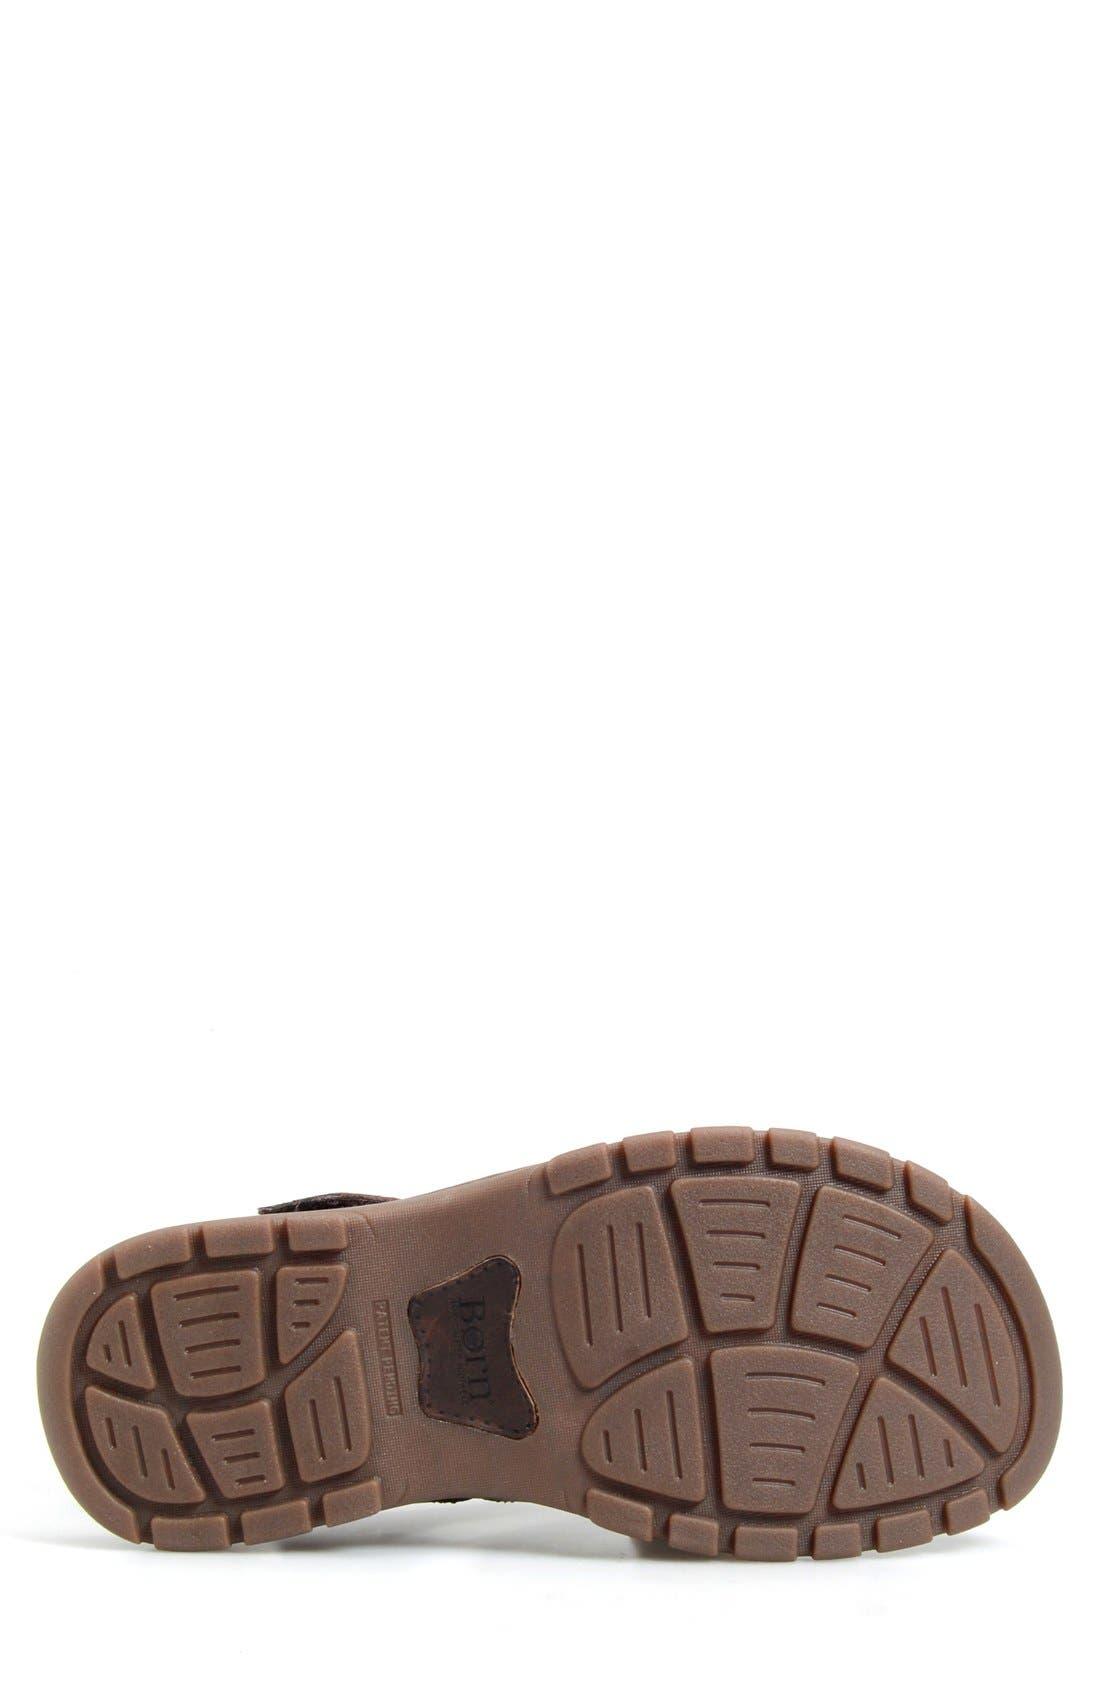 'Osmond' Leather Sandal,                             Alternate thumbnail 4, color,                             Mink